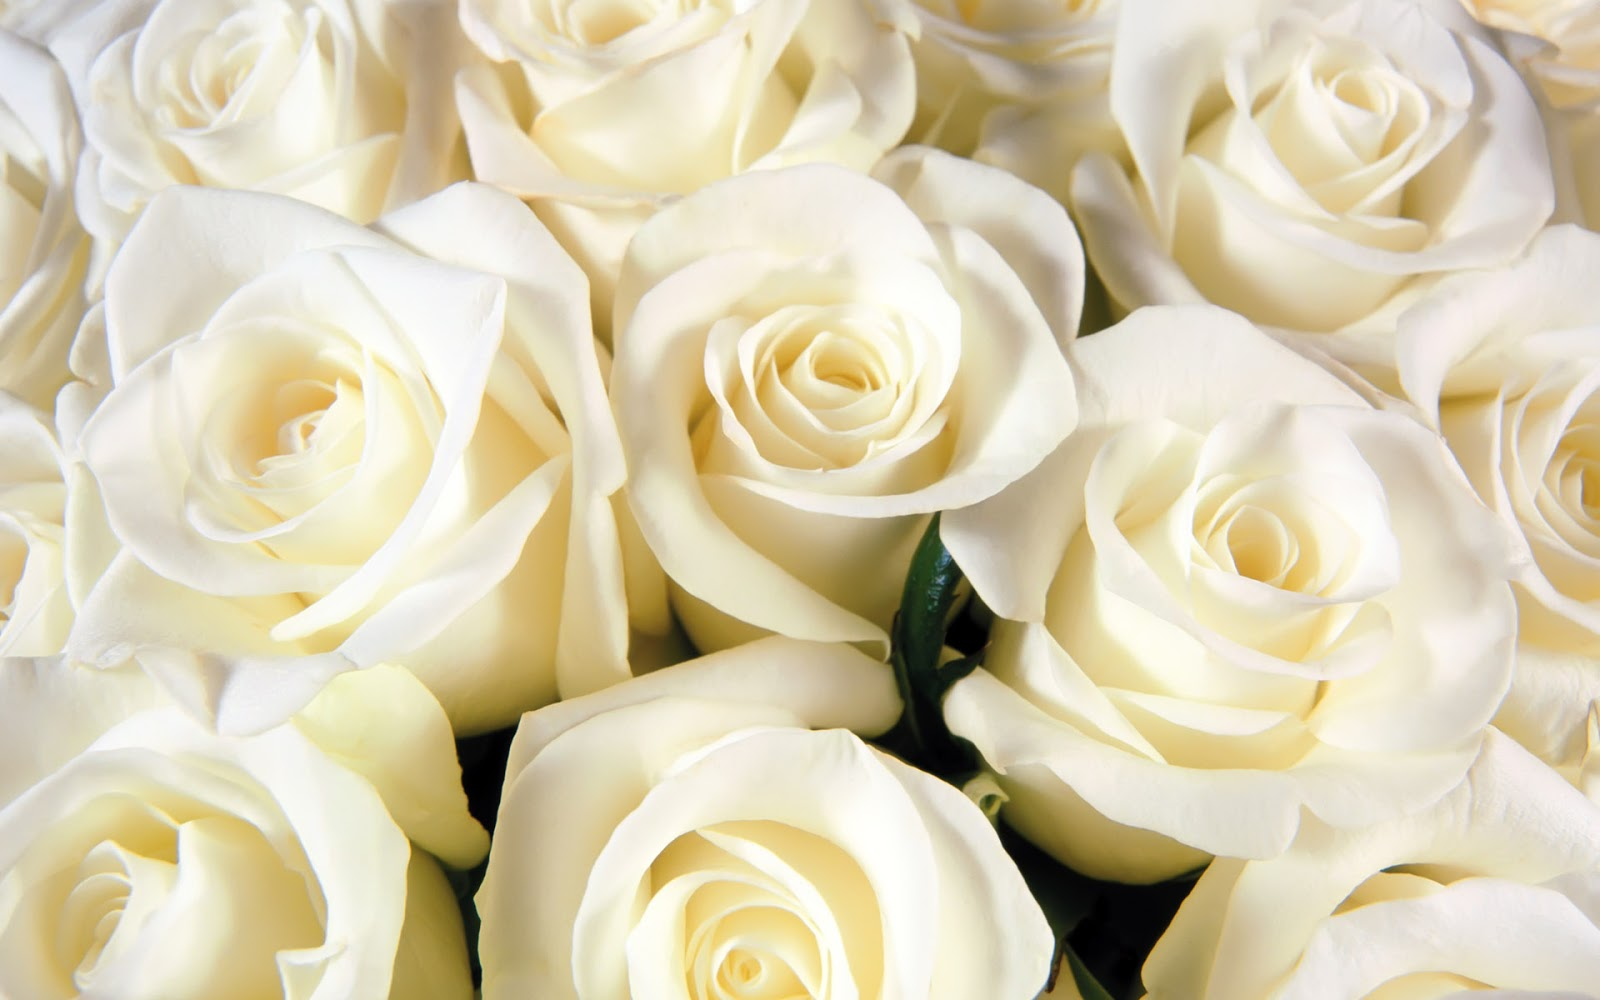 Rose 'Cherry Parfait' Rosa blooming flower white rose ...  |Beautiful White Rose Flowers